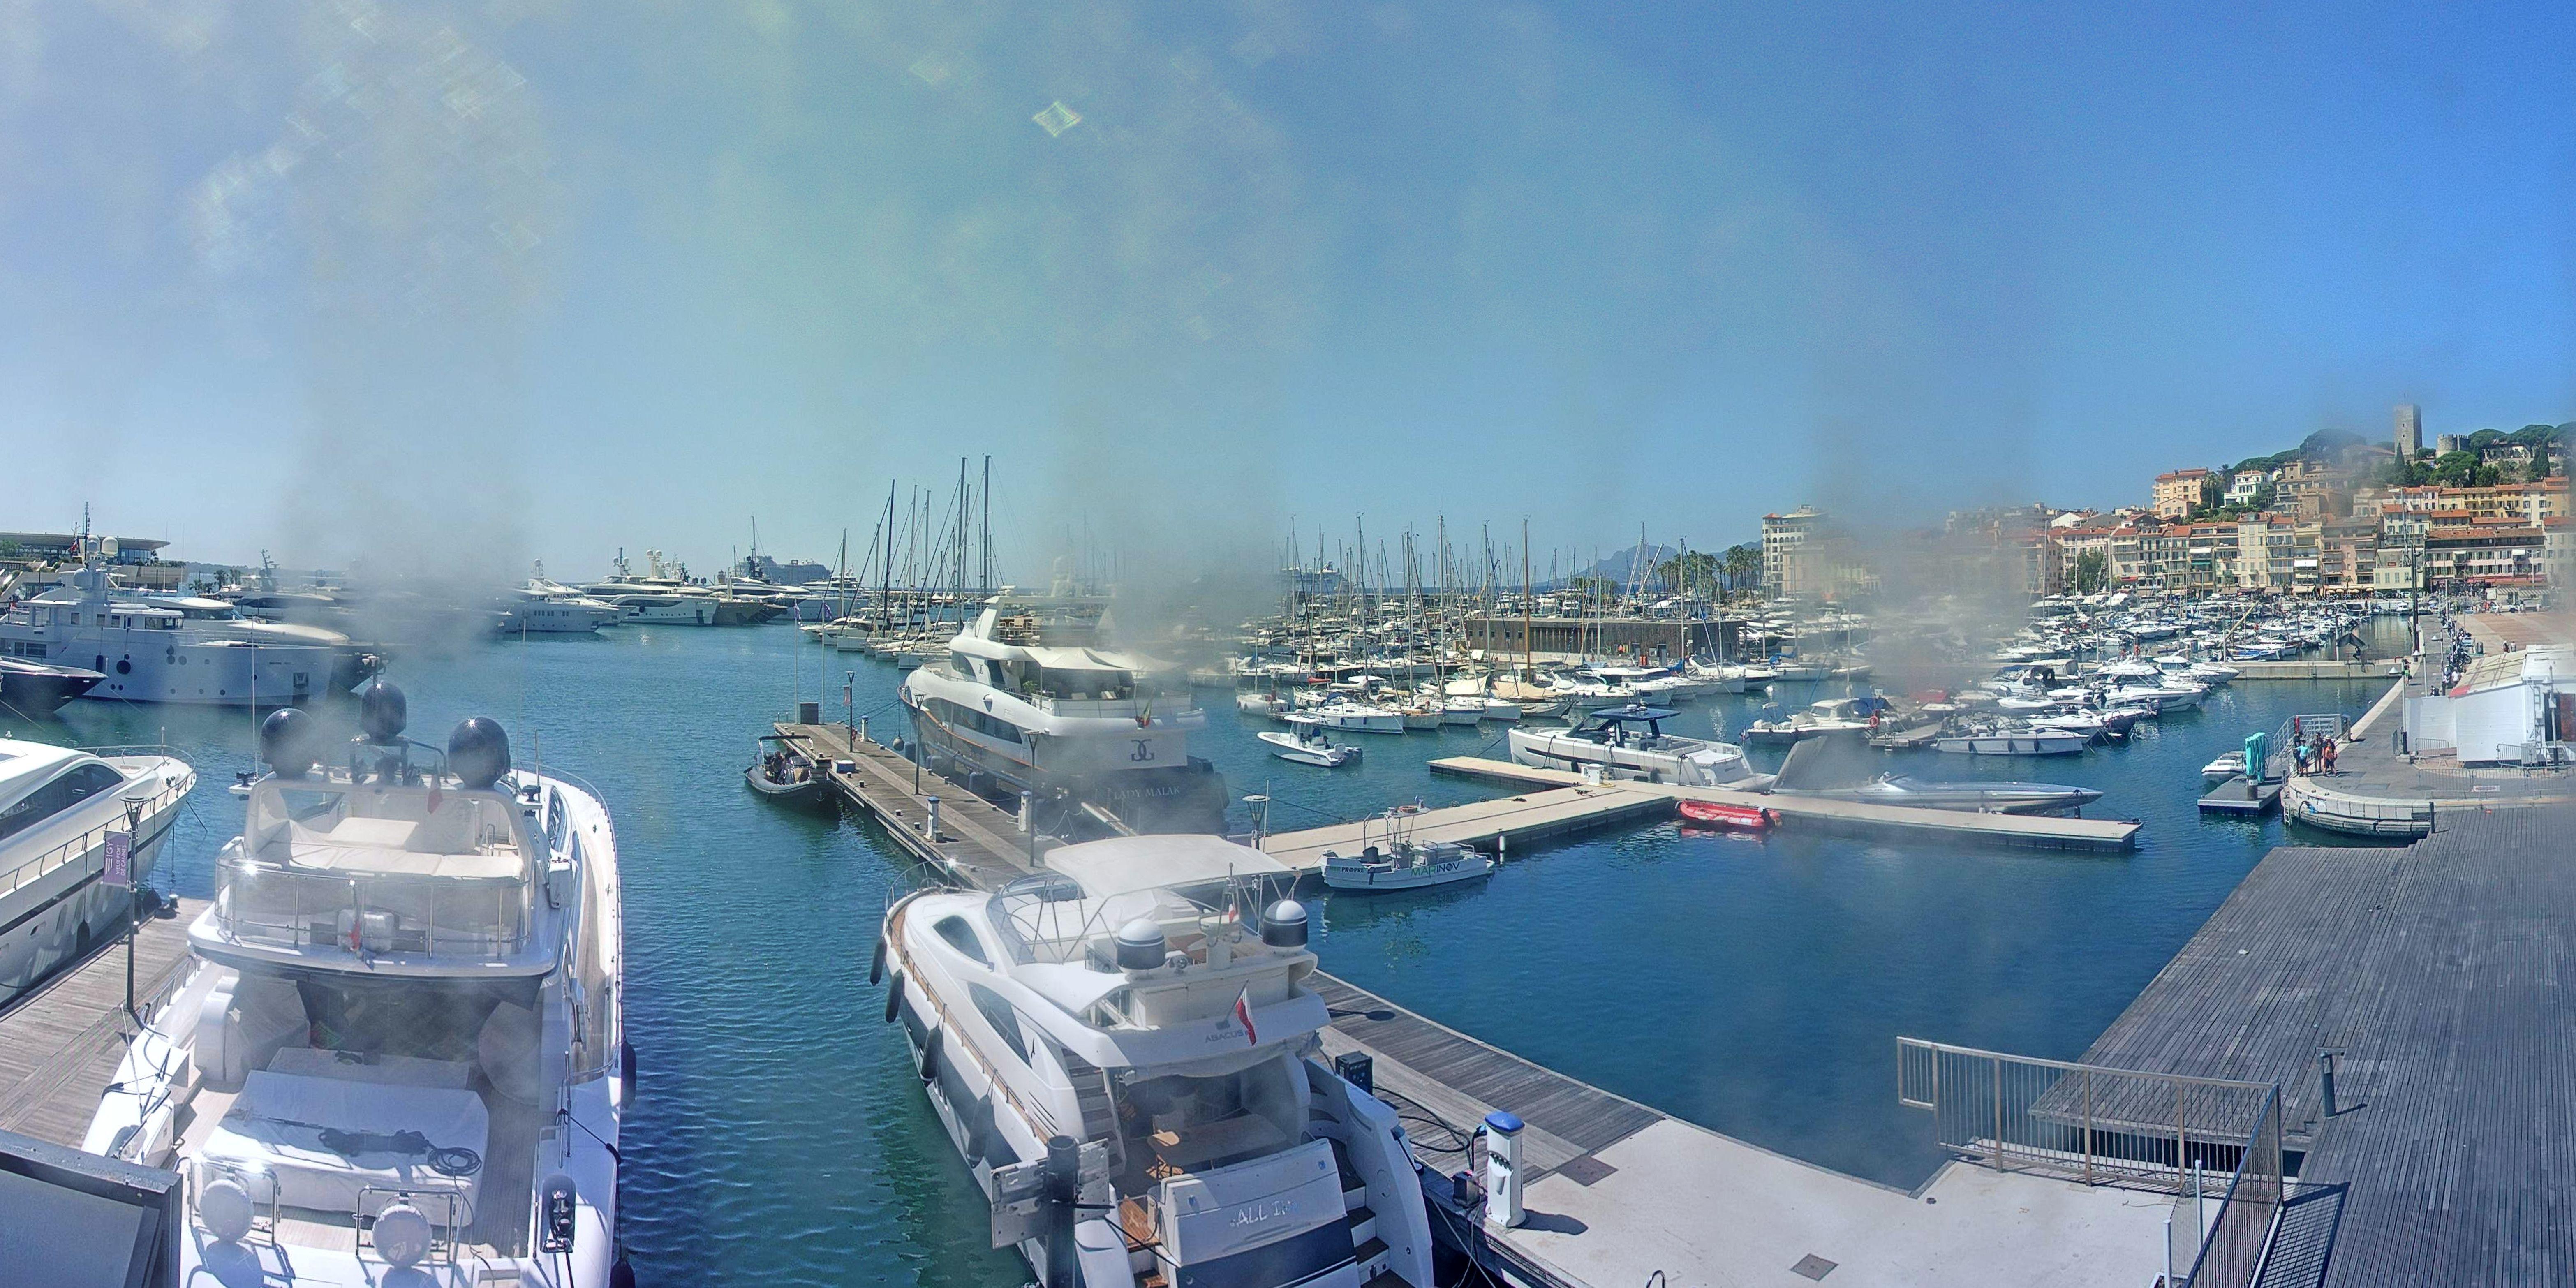 Cannes Thu. 13:35